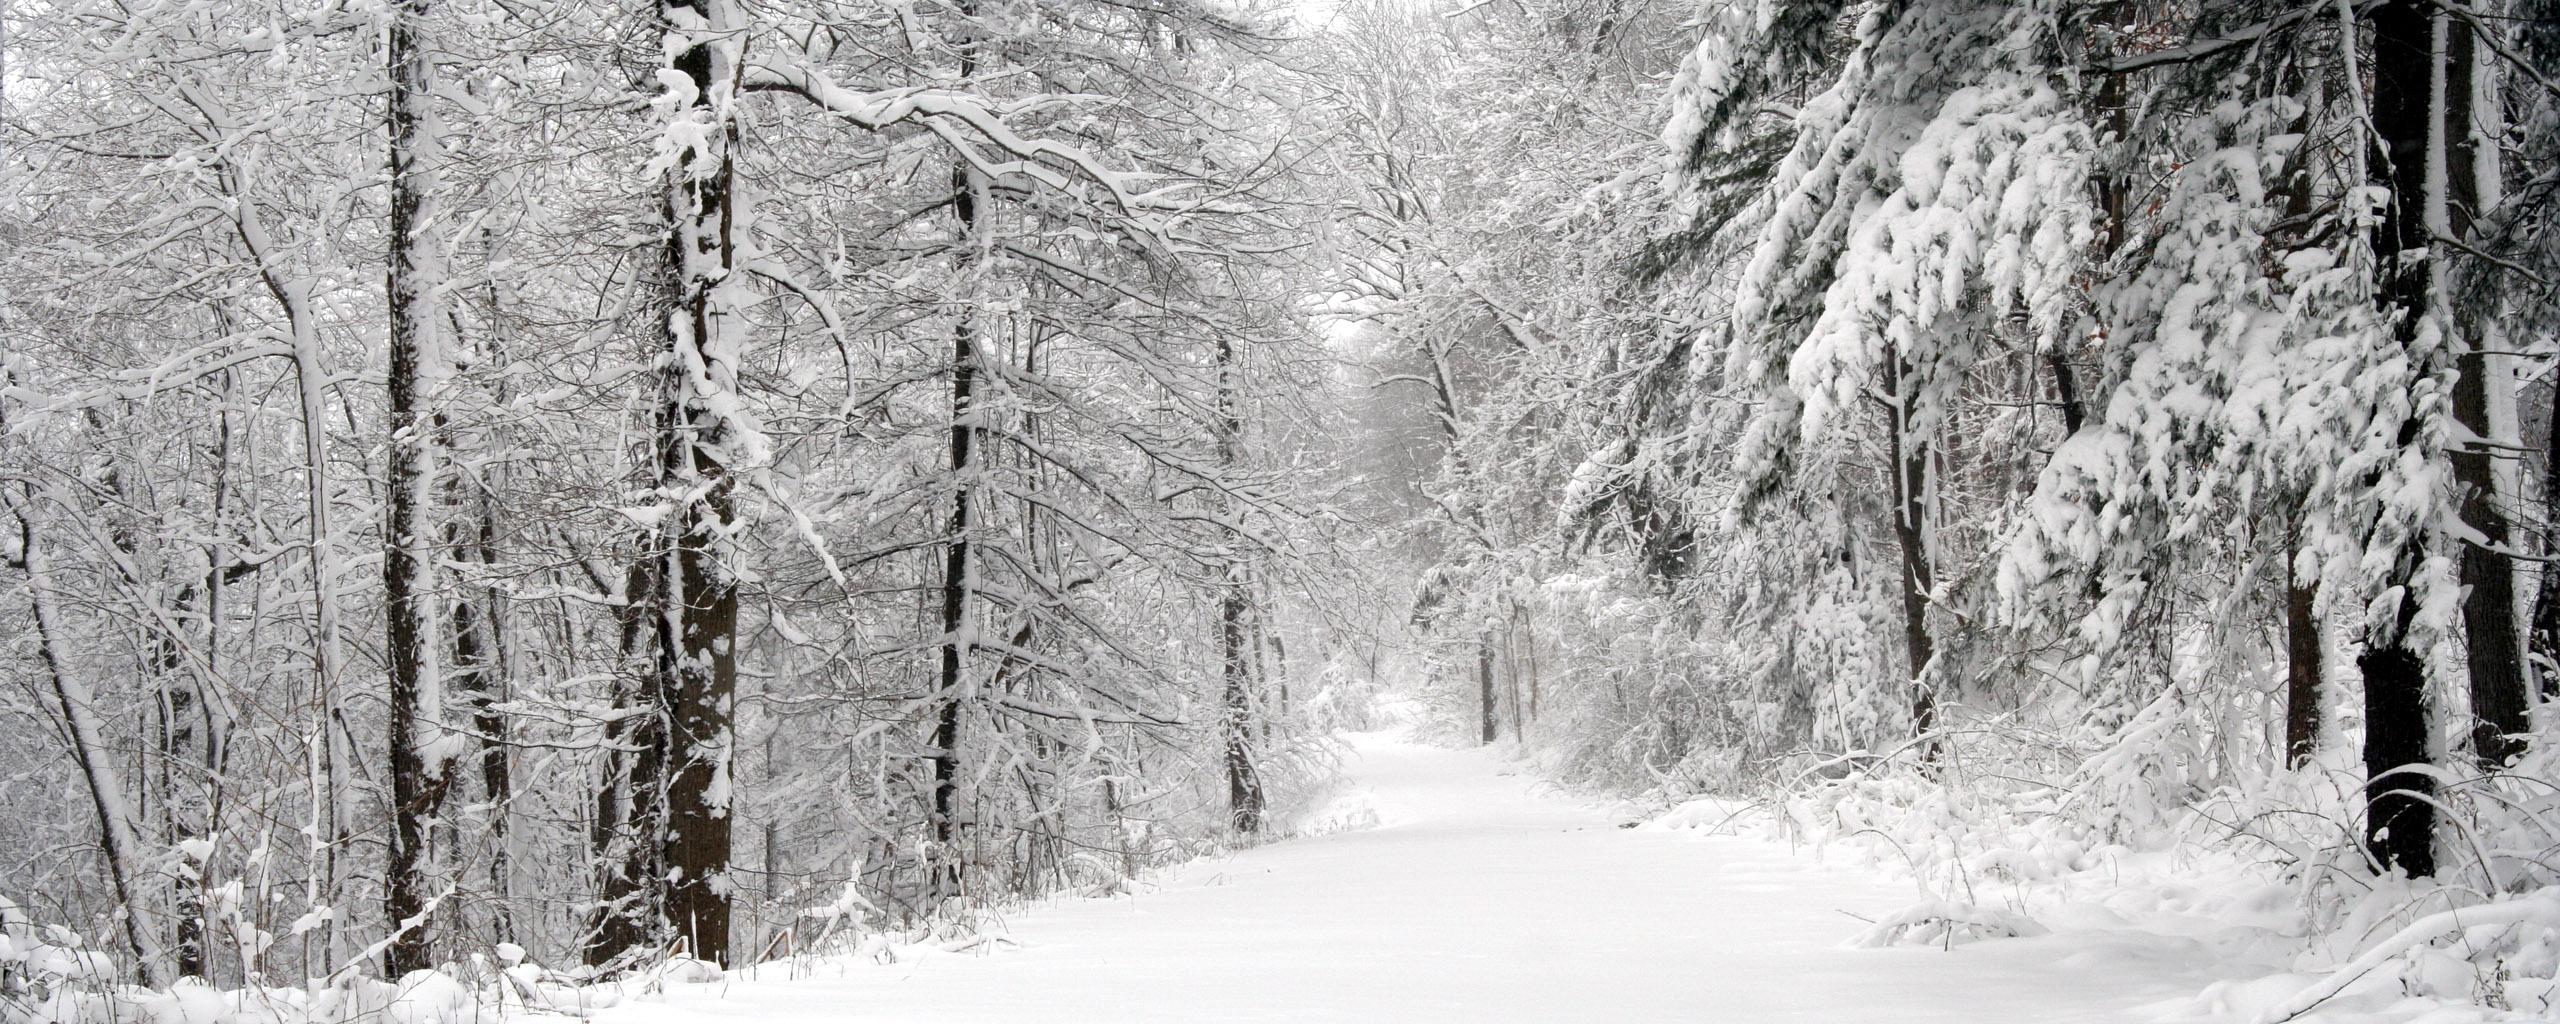 Multi Monitor - Erde/Natur  Snow Pfad Baum Wallpaper